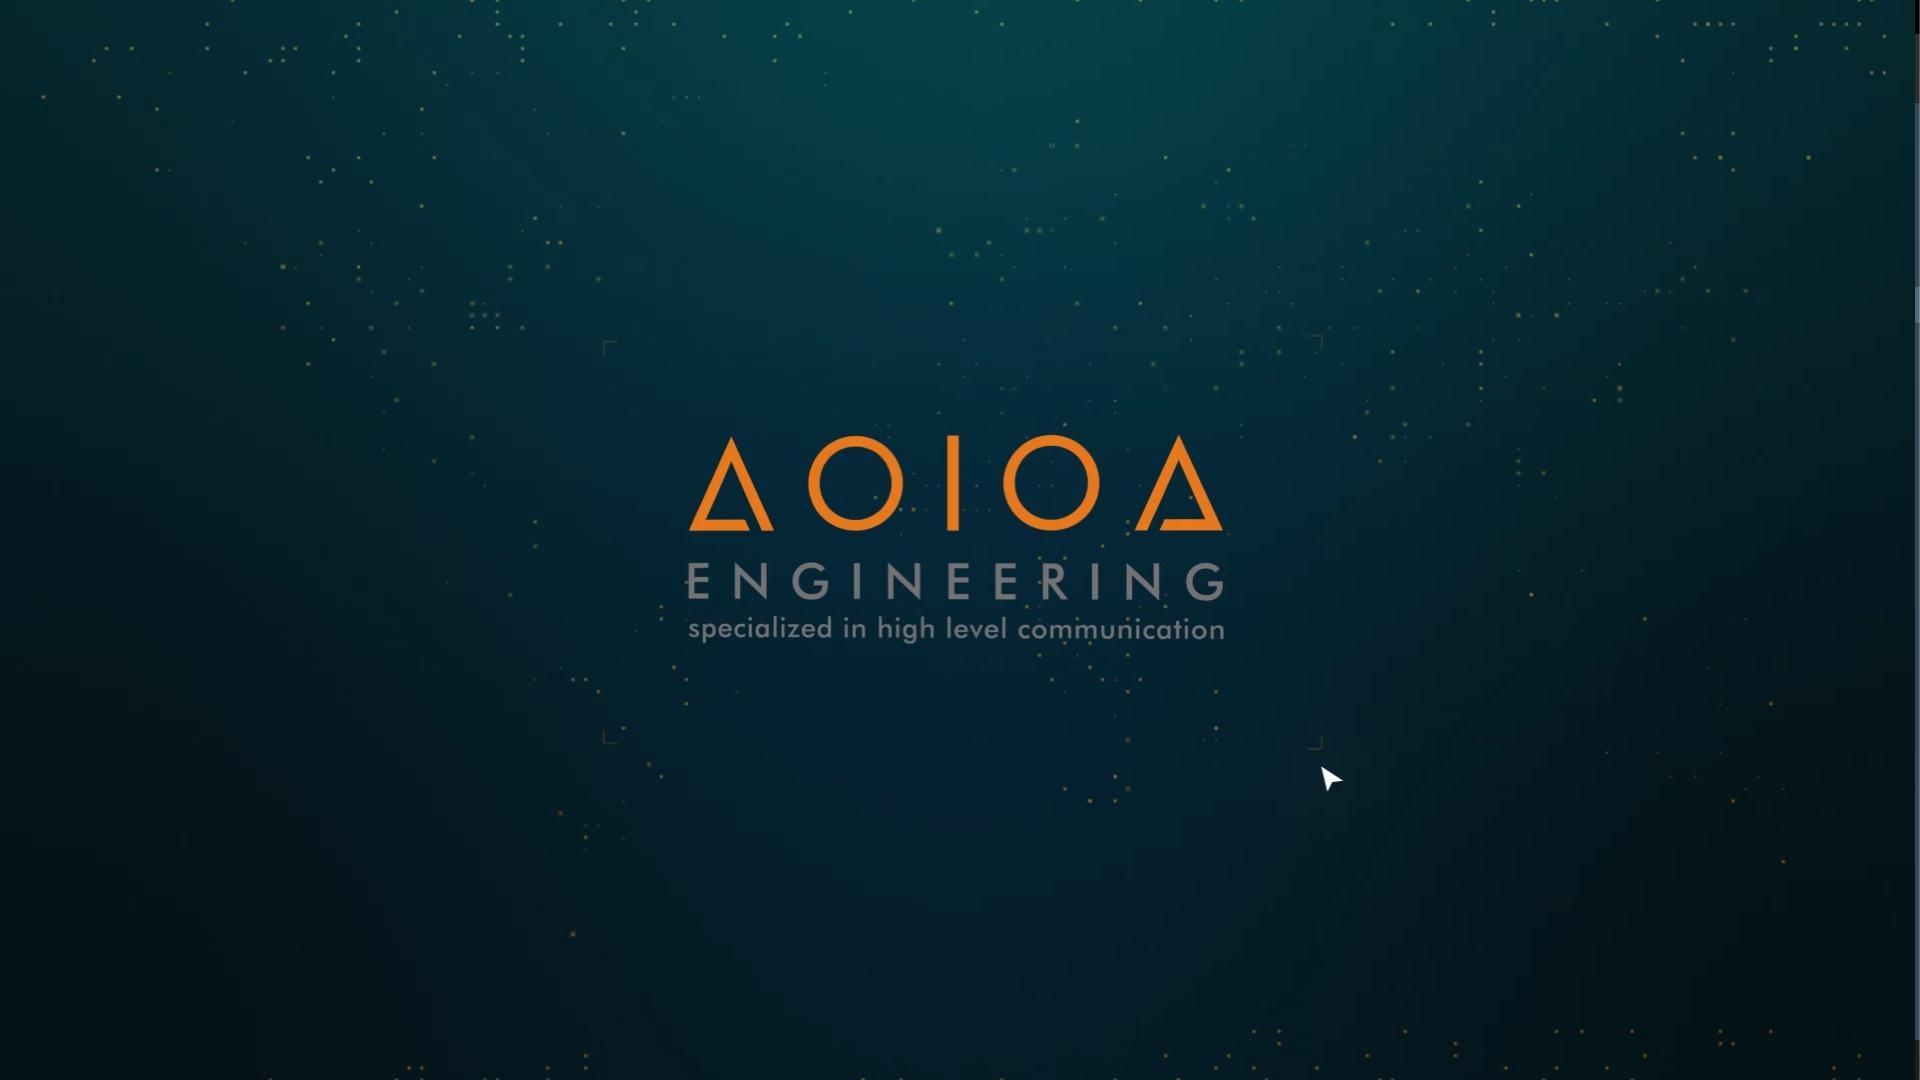 https://www.aoloa.de/sites/default/files/revslider/image/aoloa_cover.jpg